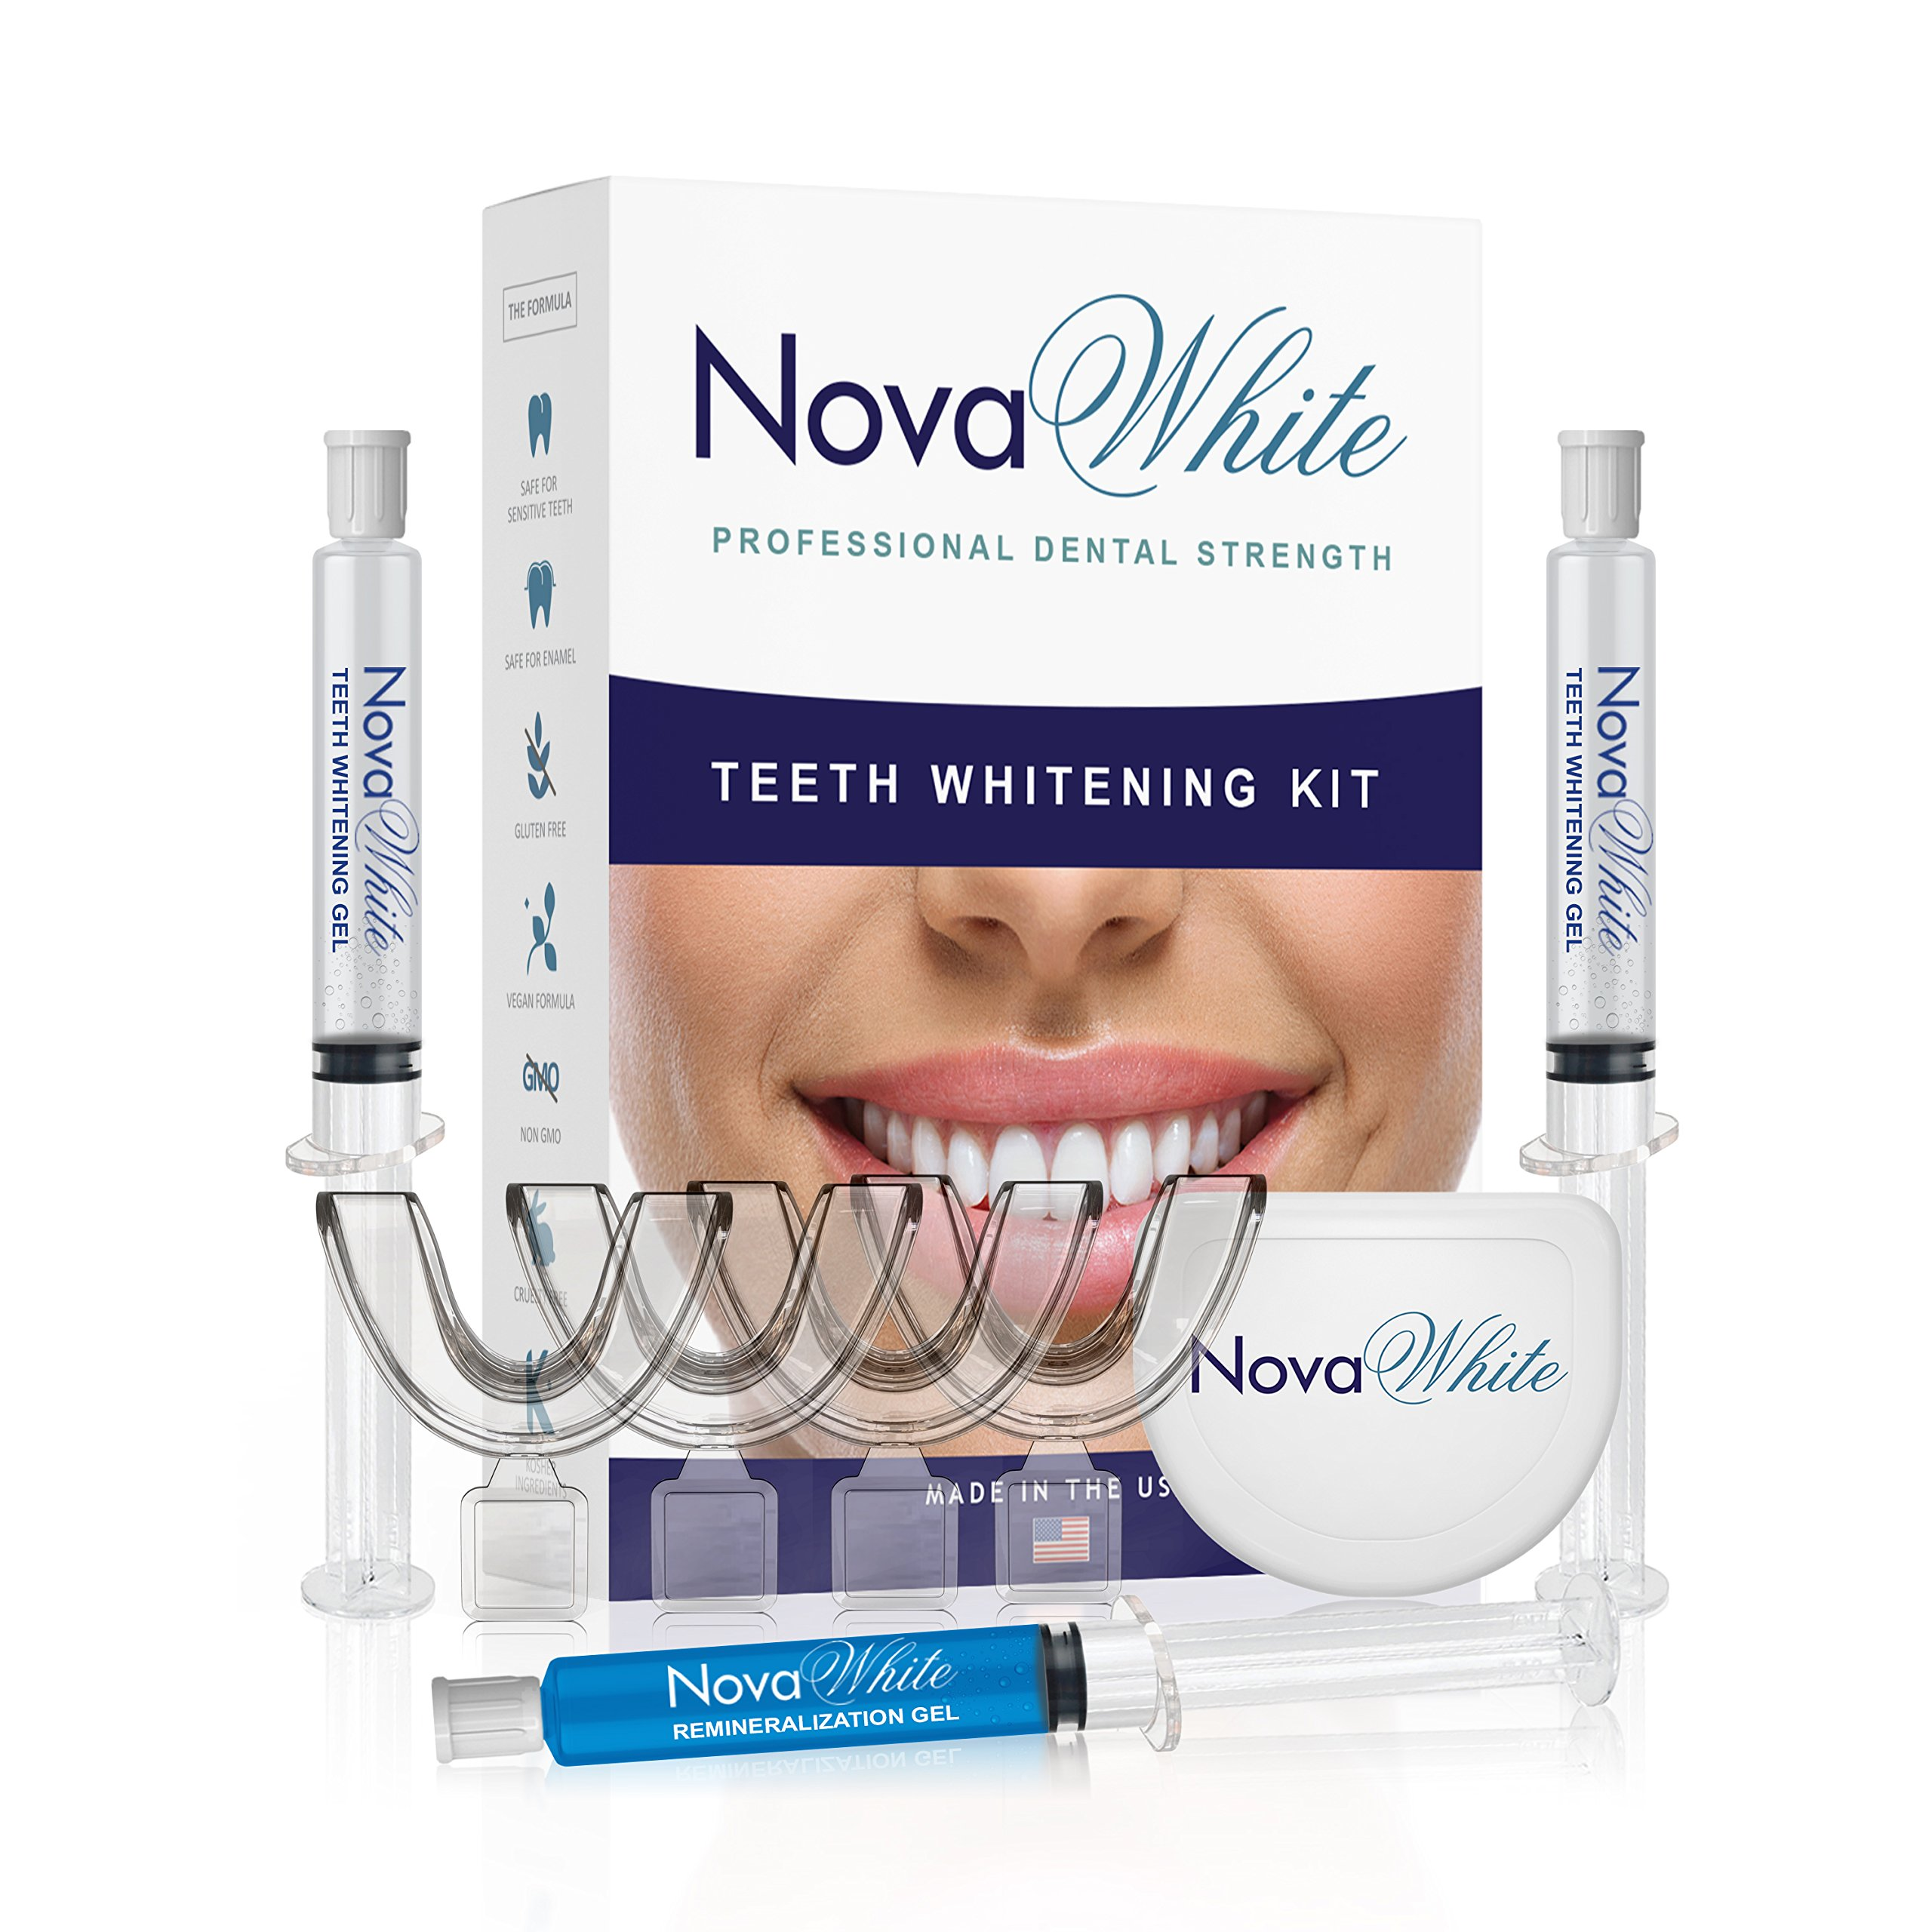 NovaWhite At Home Teeth Whitening Kit, 40 Whitening Treatments, (4) Whitener Trays, No Sensitivity Gel, At Home Professional Teeth Whitening Kit, Best Tooth Whitening Kit, Teeth Whitening Tray Kit